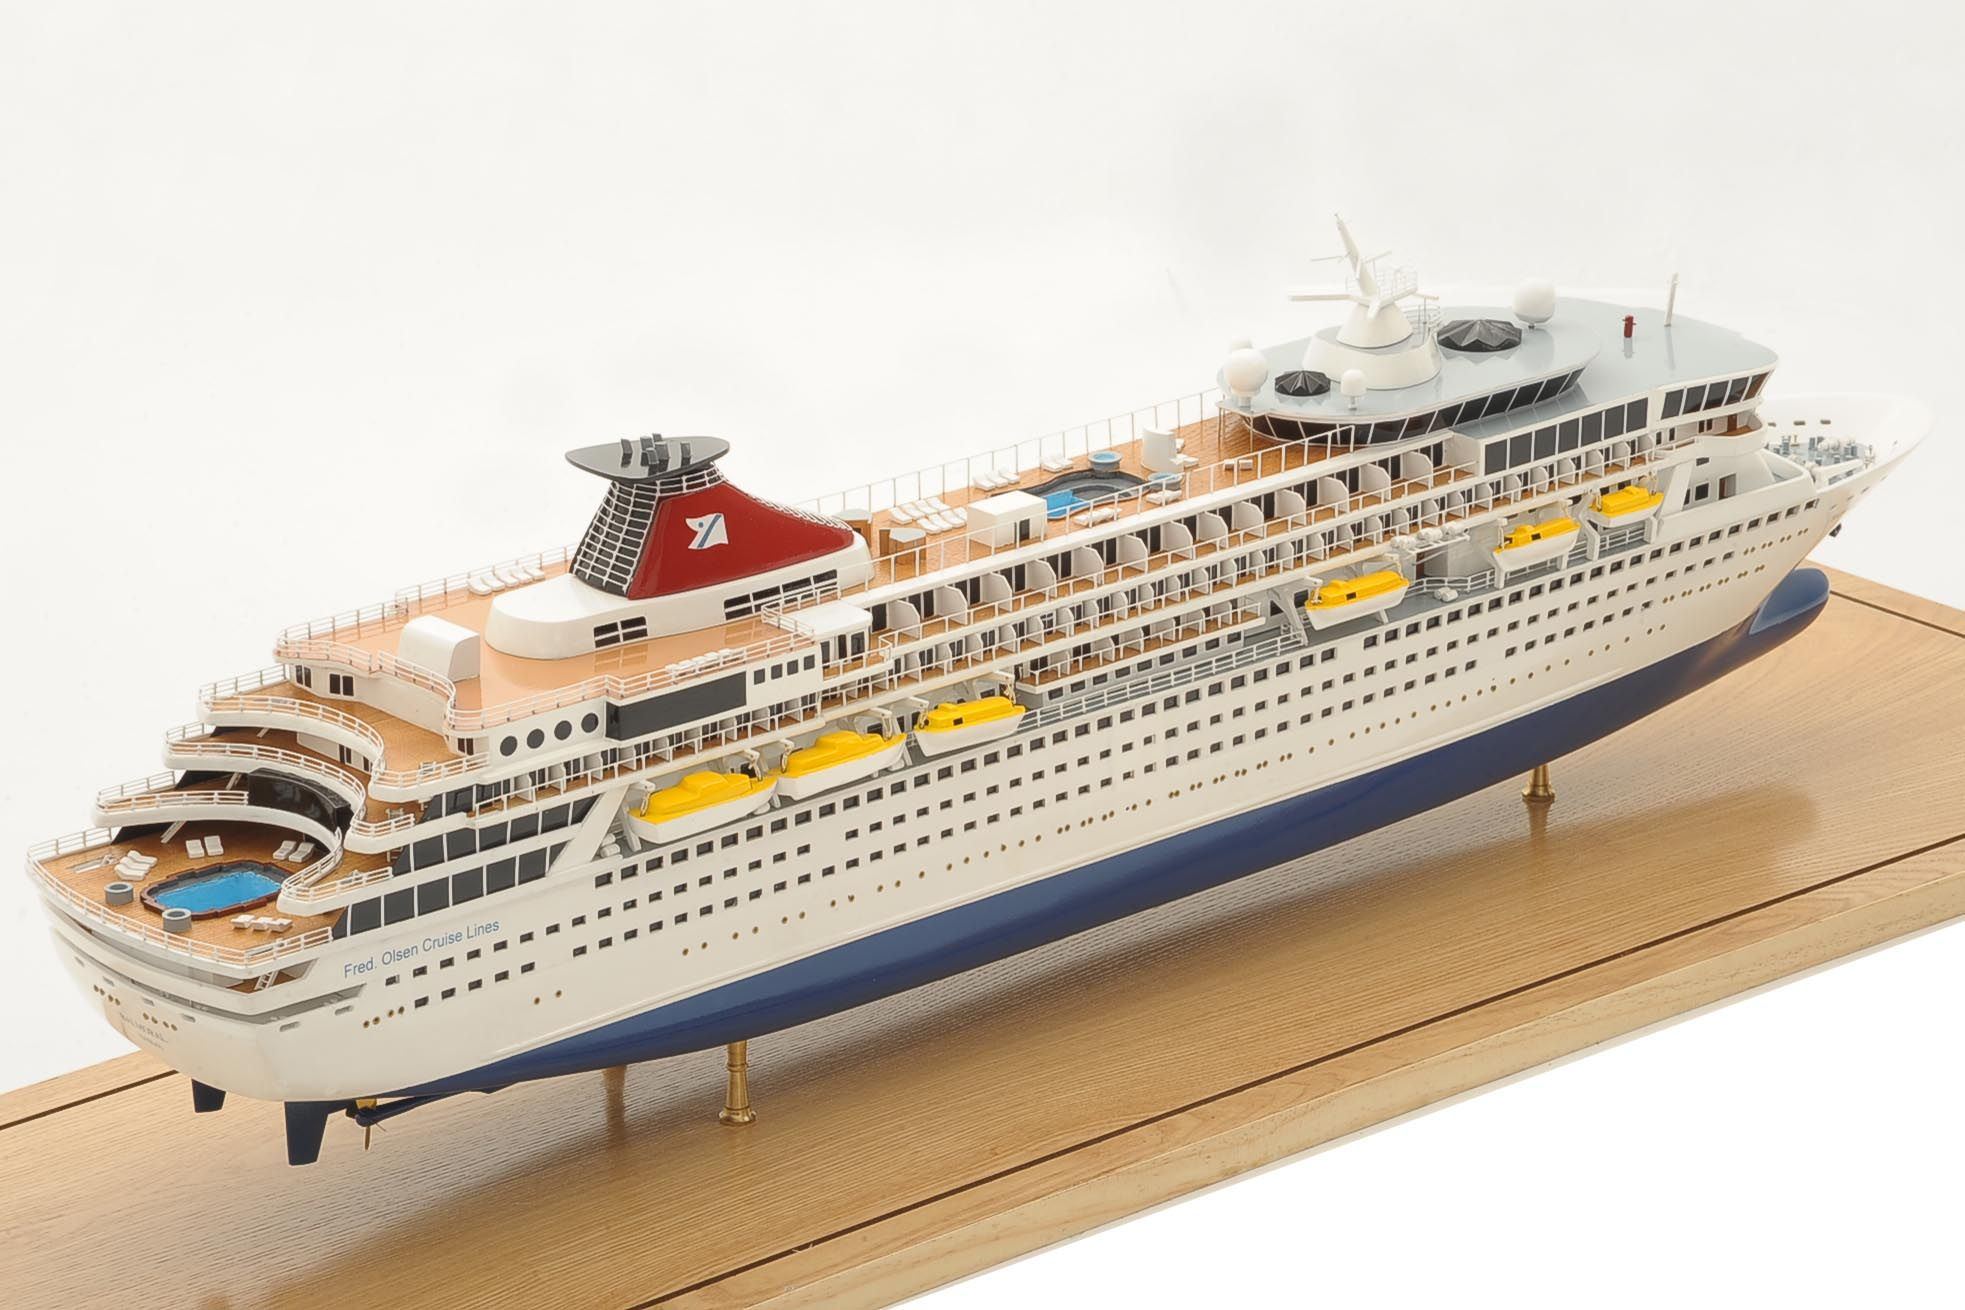 1292-6404-Balmoral-Cruise-Liner